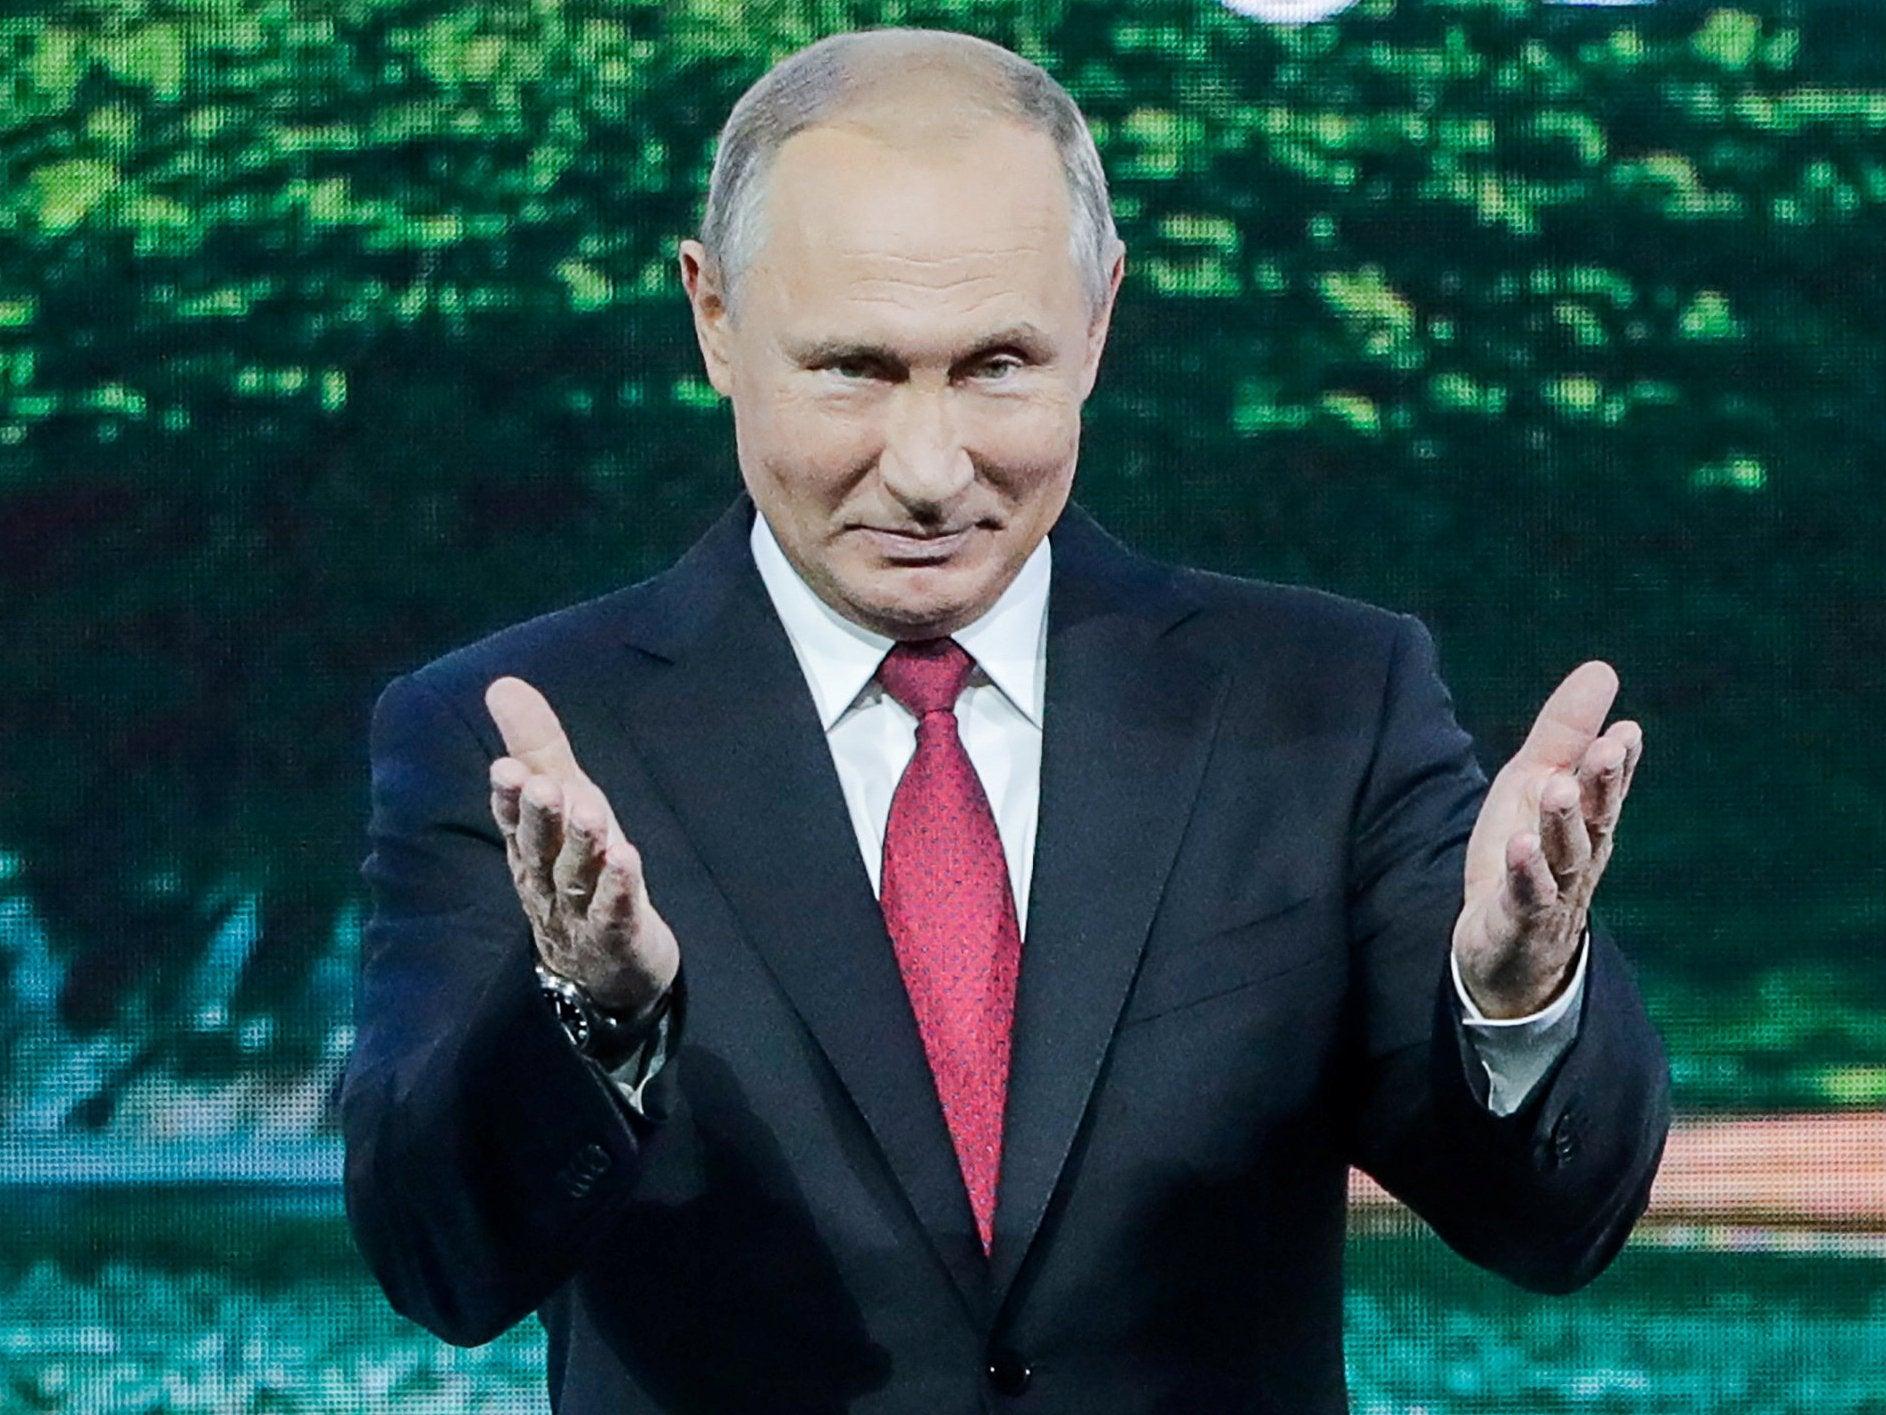 salisbury attack vladimir putin says russia knows real identities